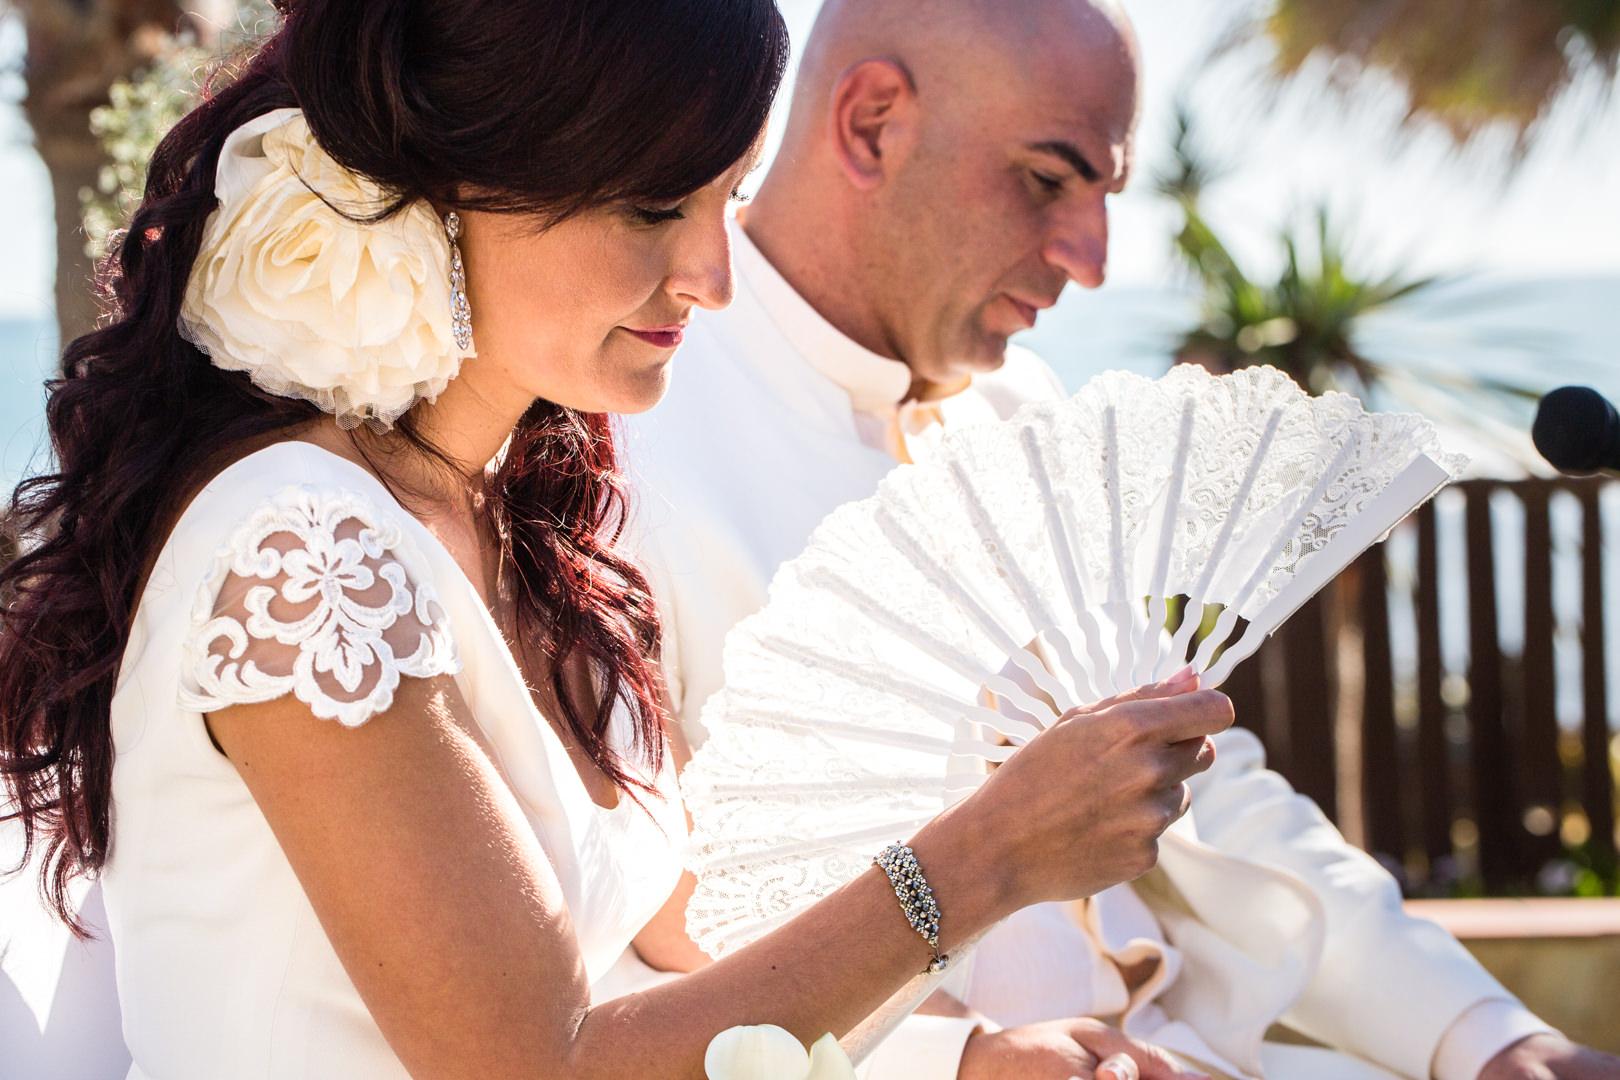 Boda-Sajorami-Beach-Cadiz-Zahora-Pedro-Gema-engagement-Rafael-Torres-fotografo-bodas-sevilla-madrid-barcelona-wedding-photographer--30.jpg